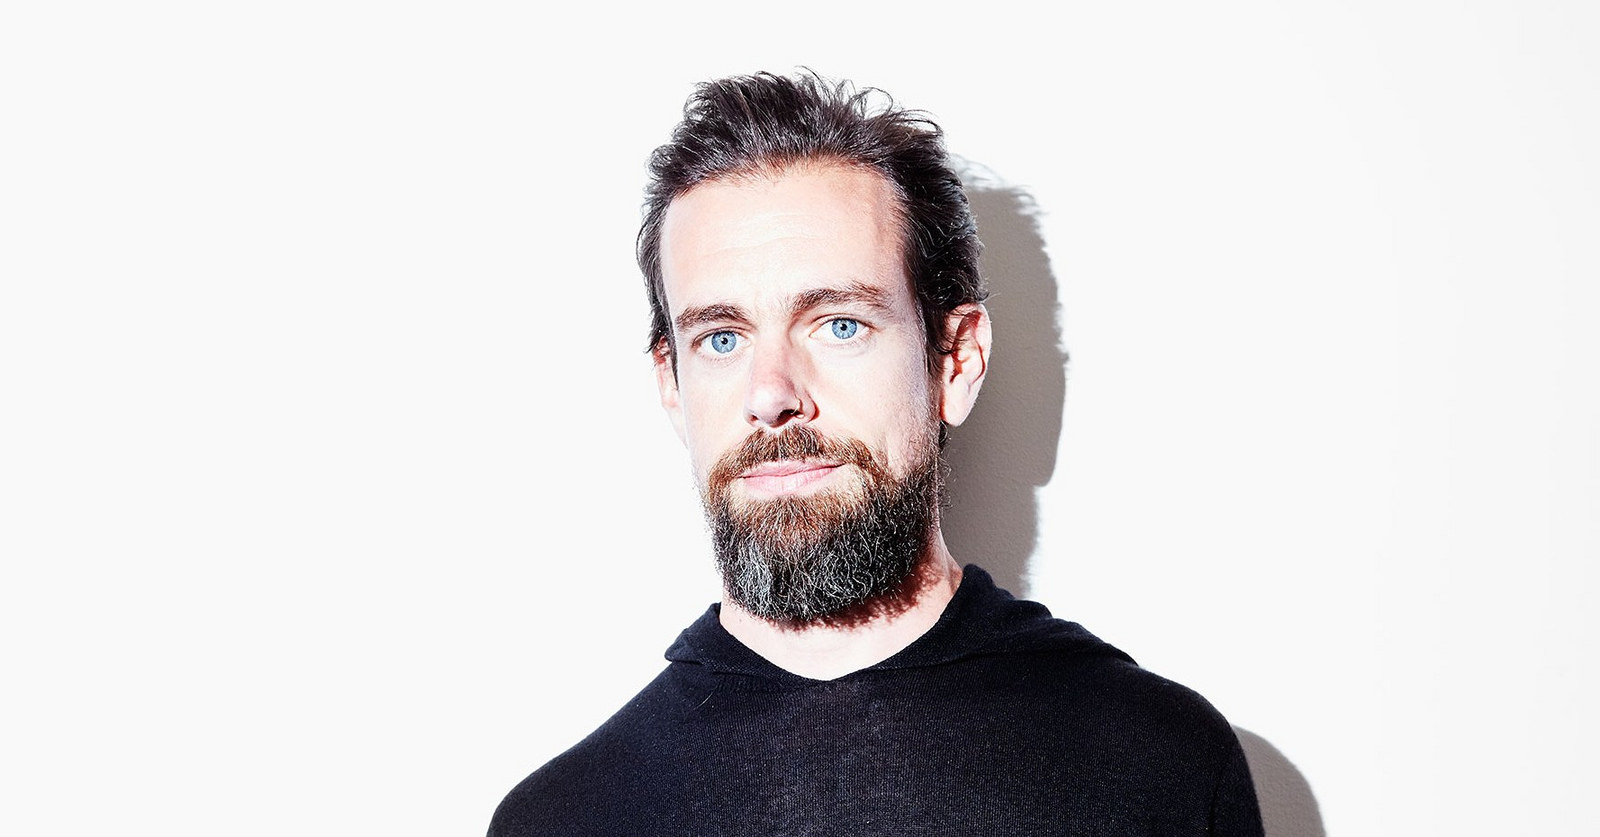 Portrait Shot of Twitter CEO